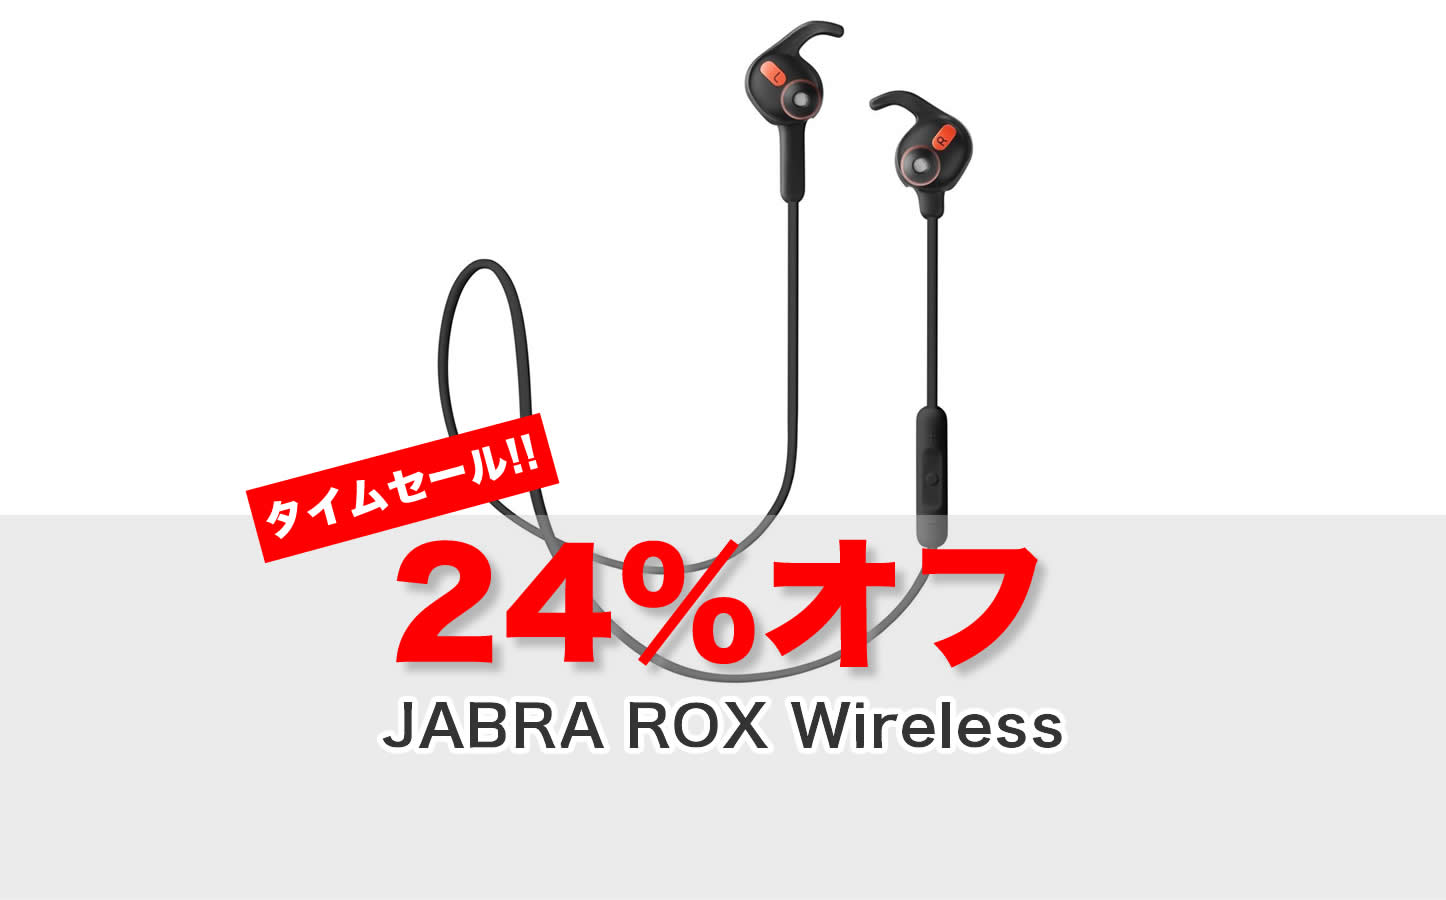 Jabra ROX Wireless Sale